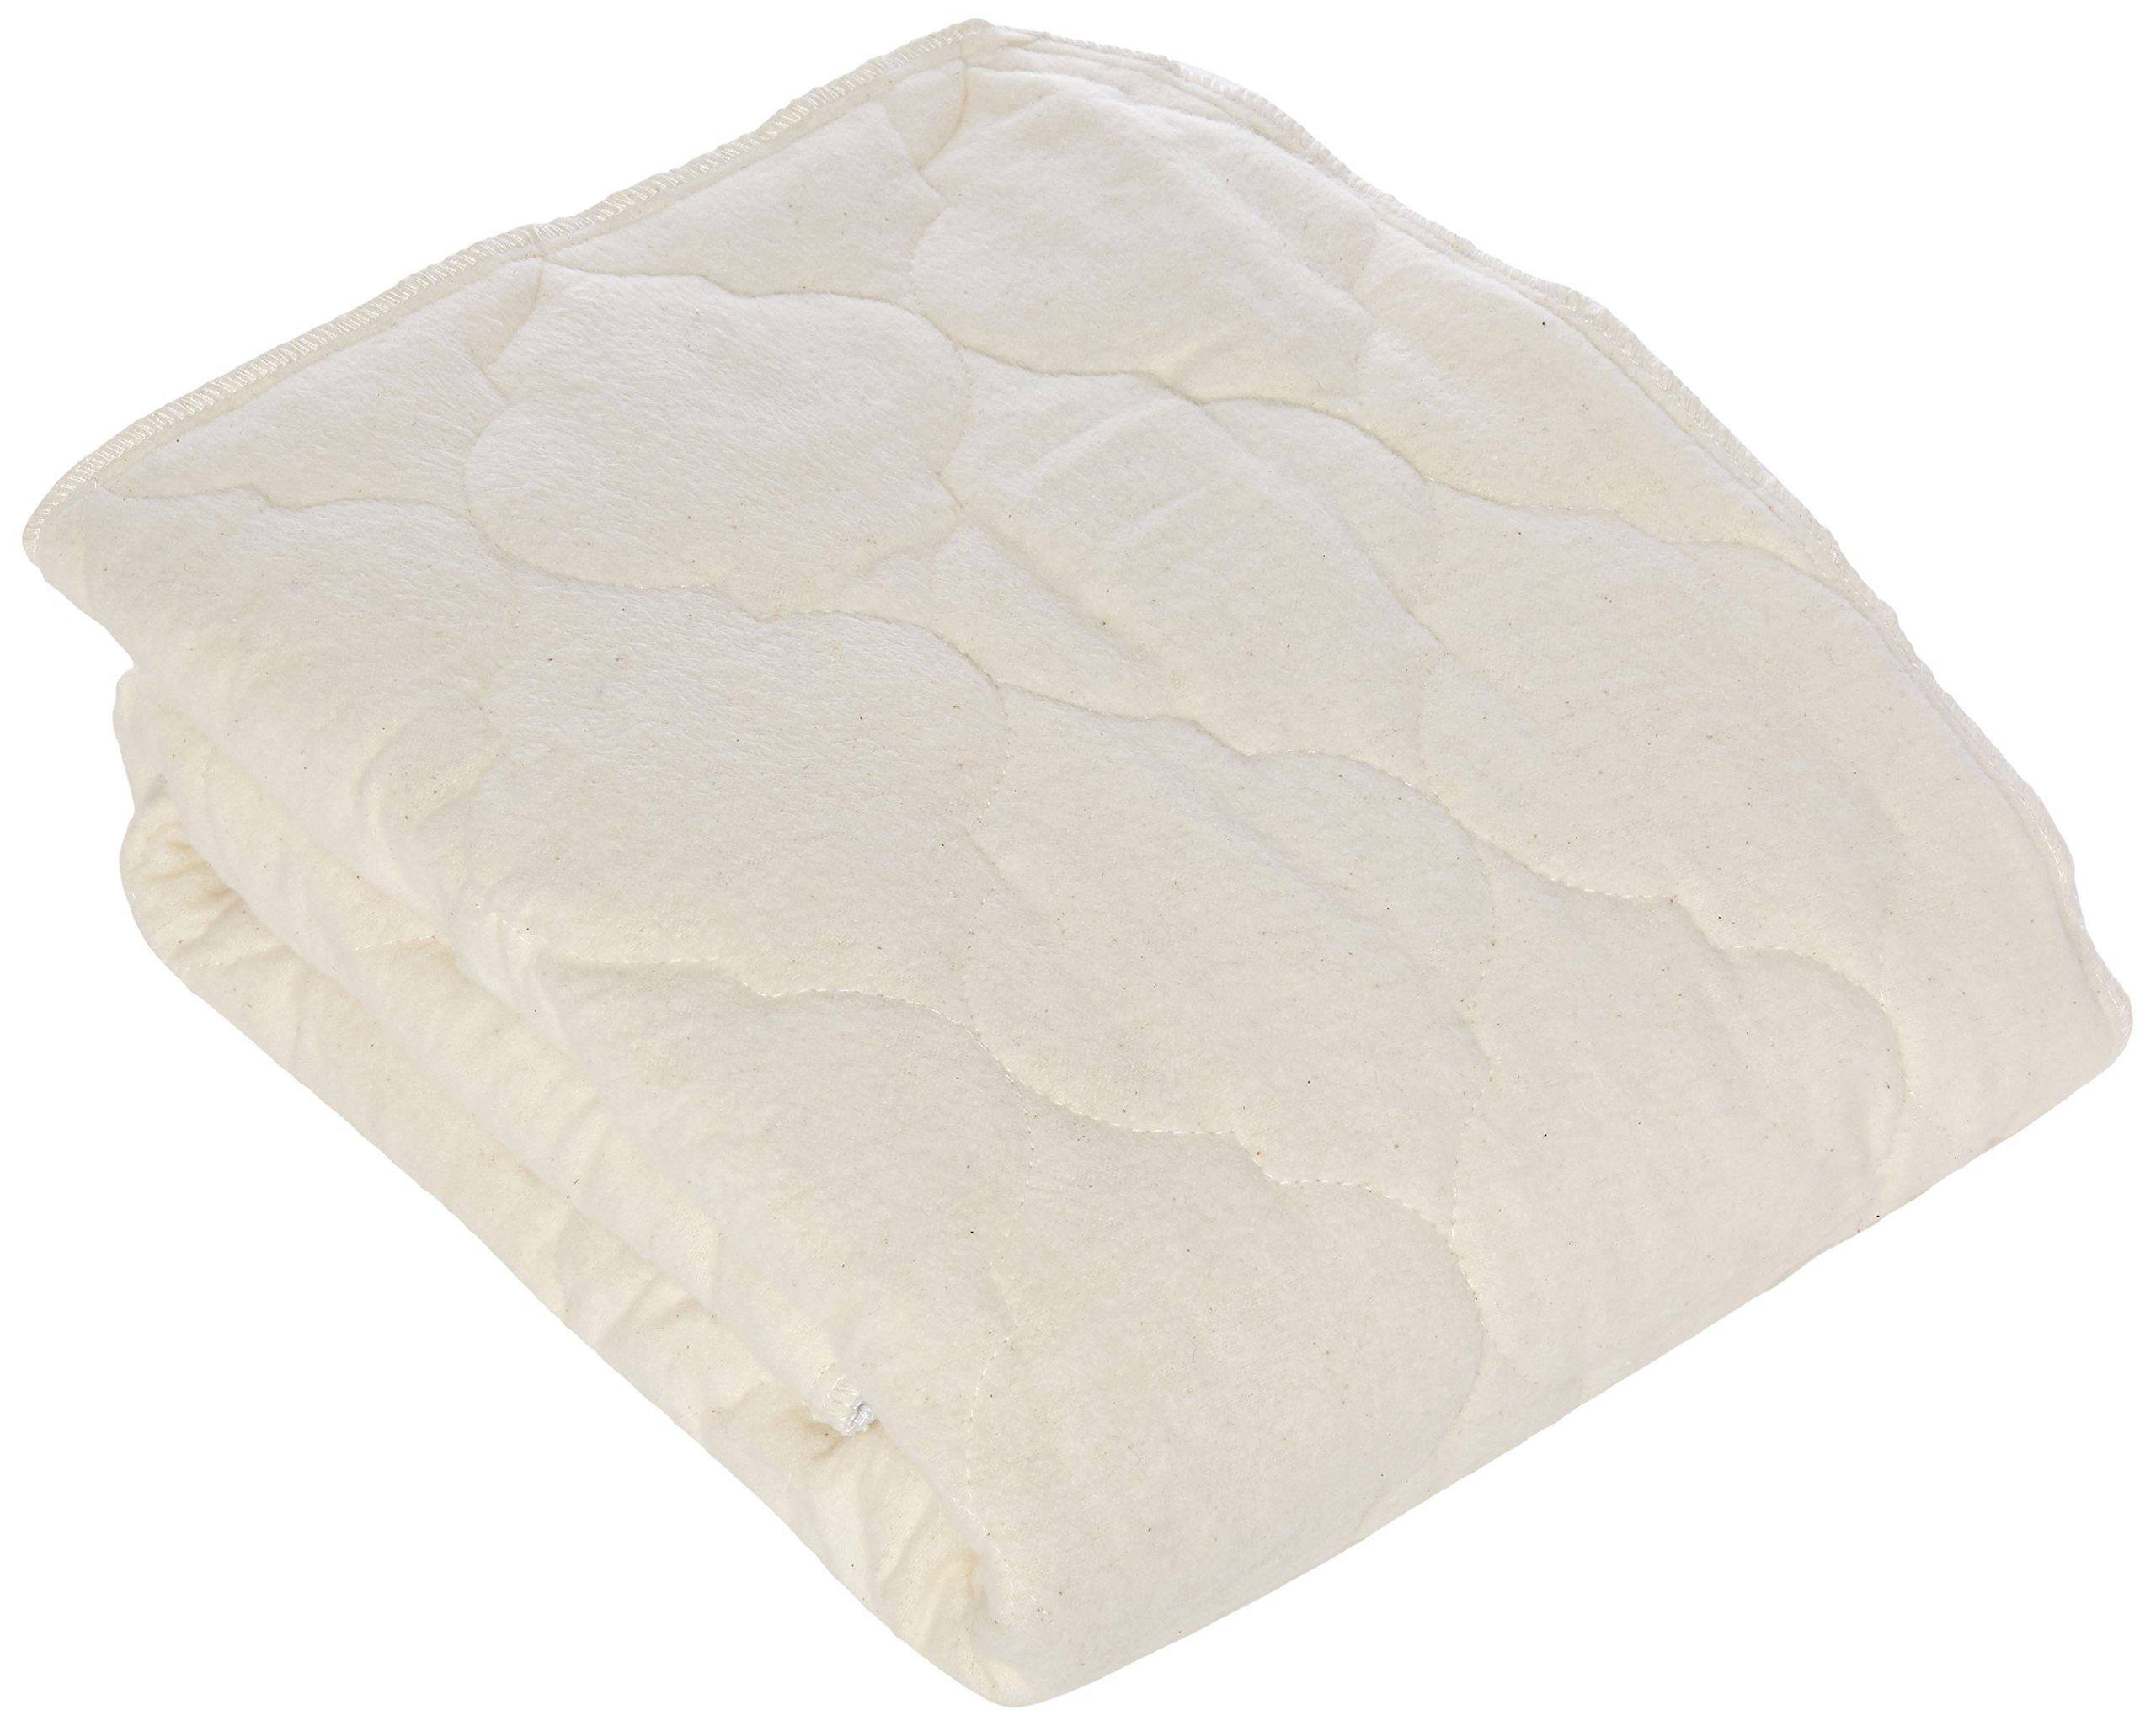 Amazon Com Snoozy Flannel Cotton Anti Allergy Waterproof